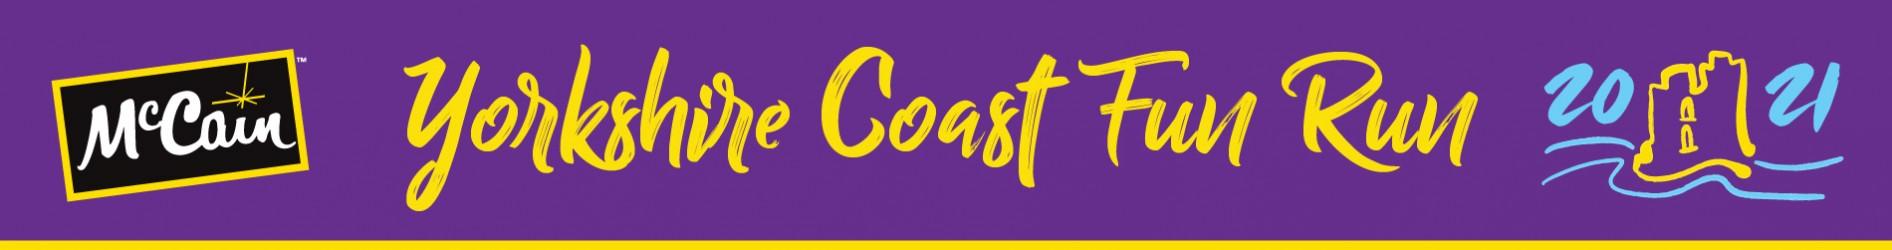 The McCains Yorkshire Coast JUNIOR FUN RUN courtsey of Scarborough Athletic Club